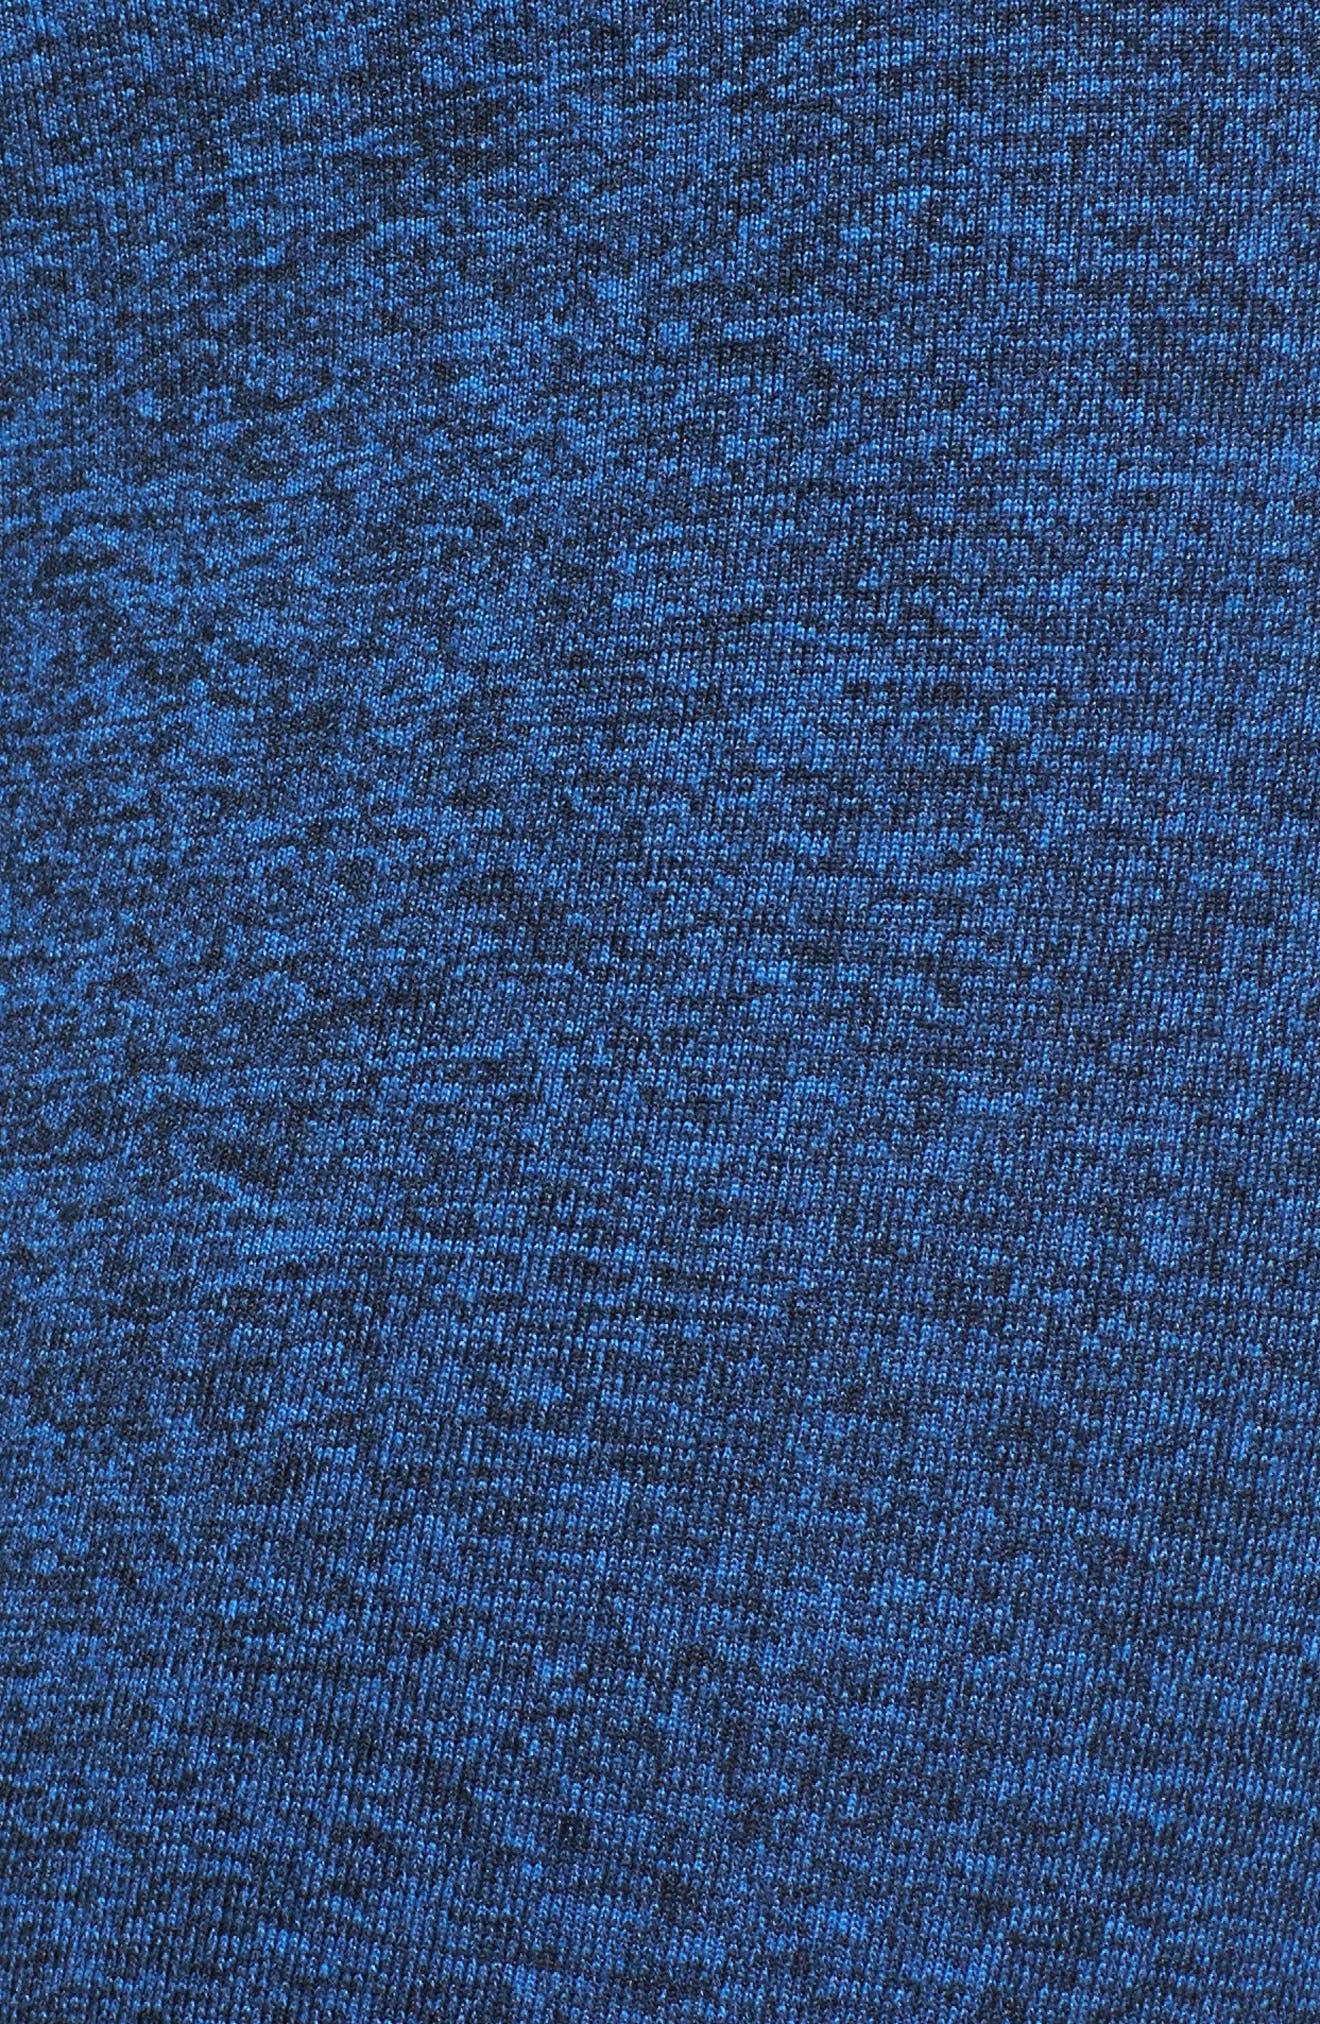 Yoga Apparel High Waist Openwork Leggings,                             Alternate thumbnail 6, color,                             Moonlight Blue Majestic